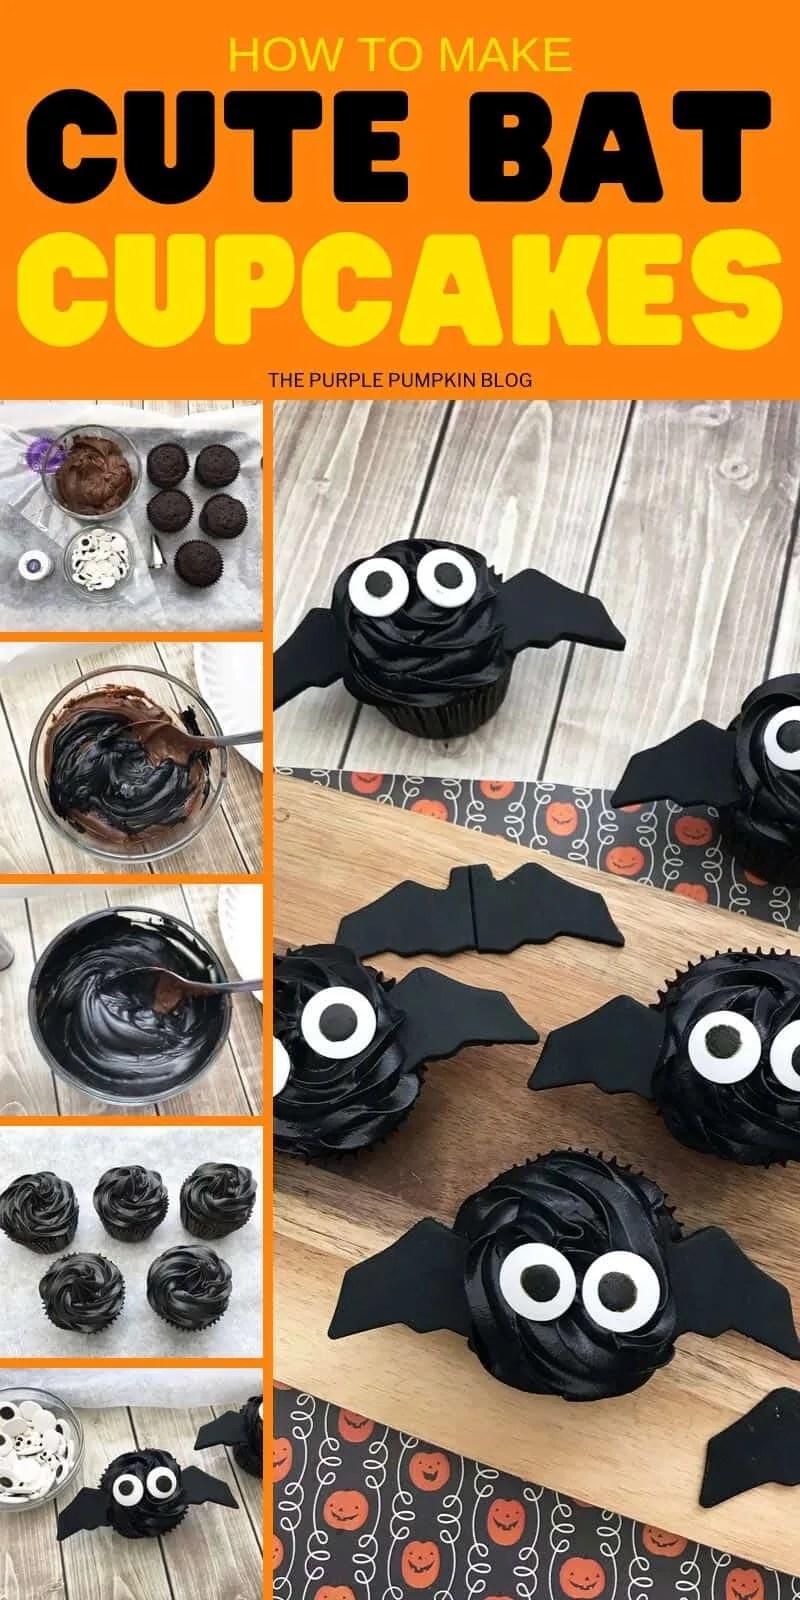 How to make cute bat cupcakes